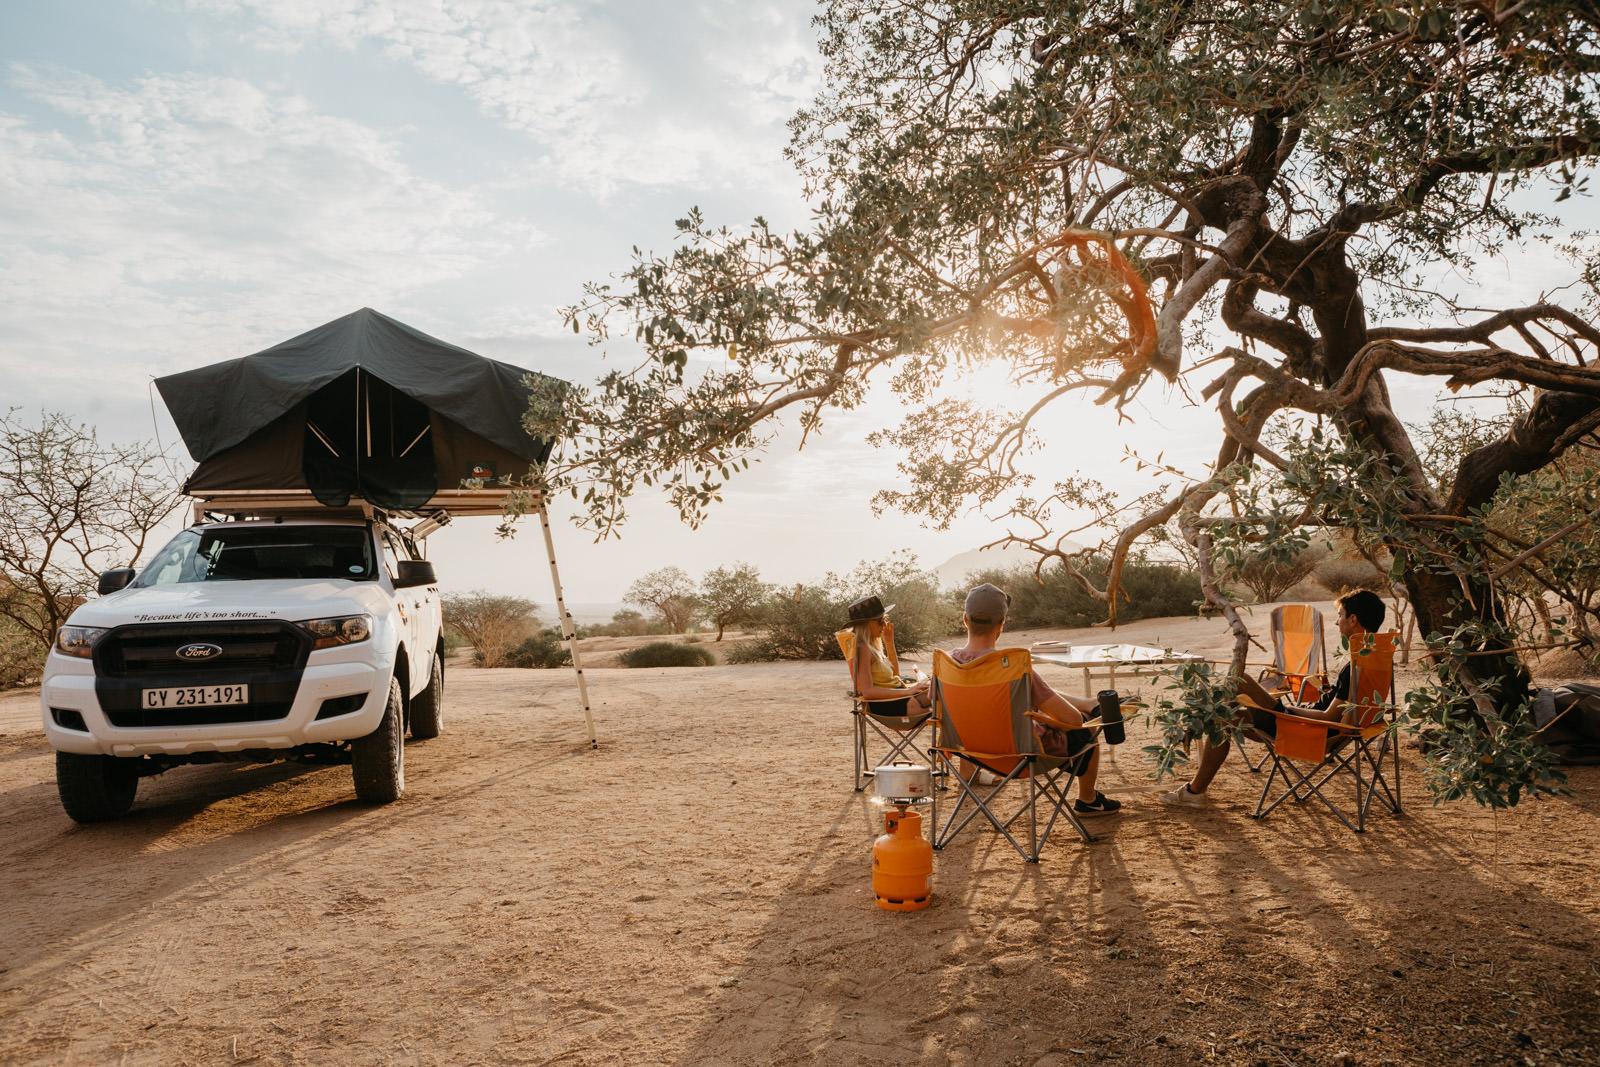 namibia_trip_rooftent_camping_roadtrip (9 von 18).jpg